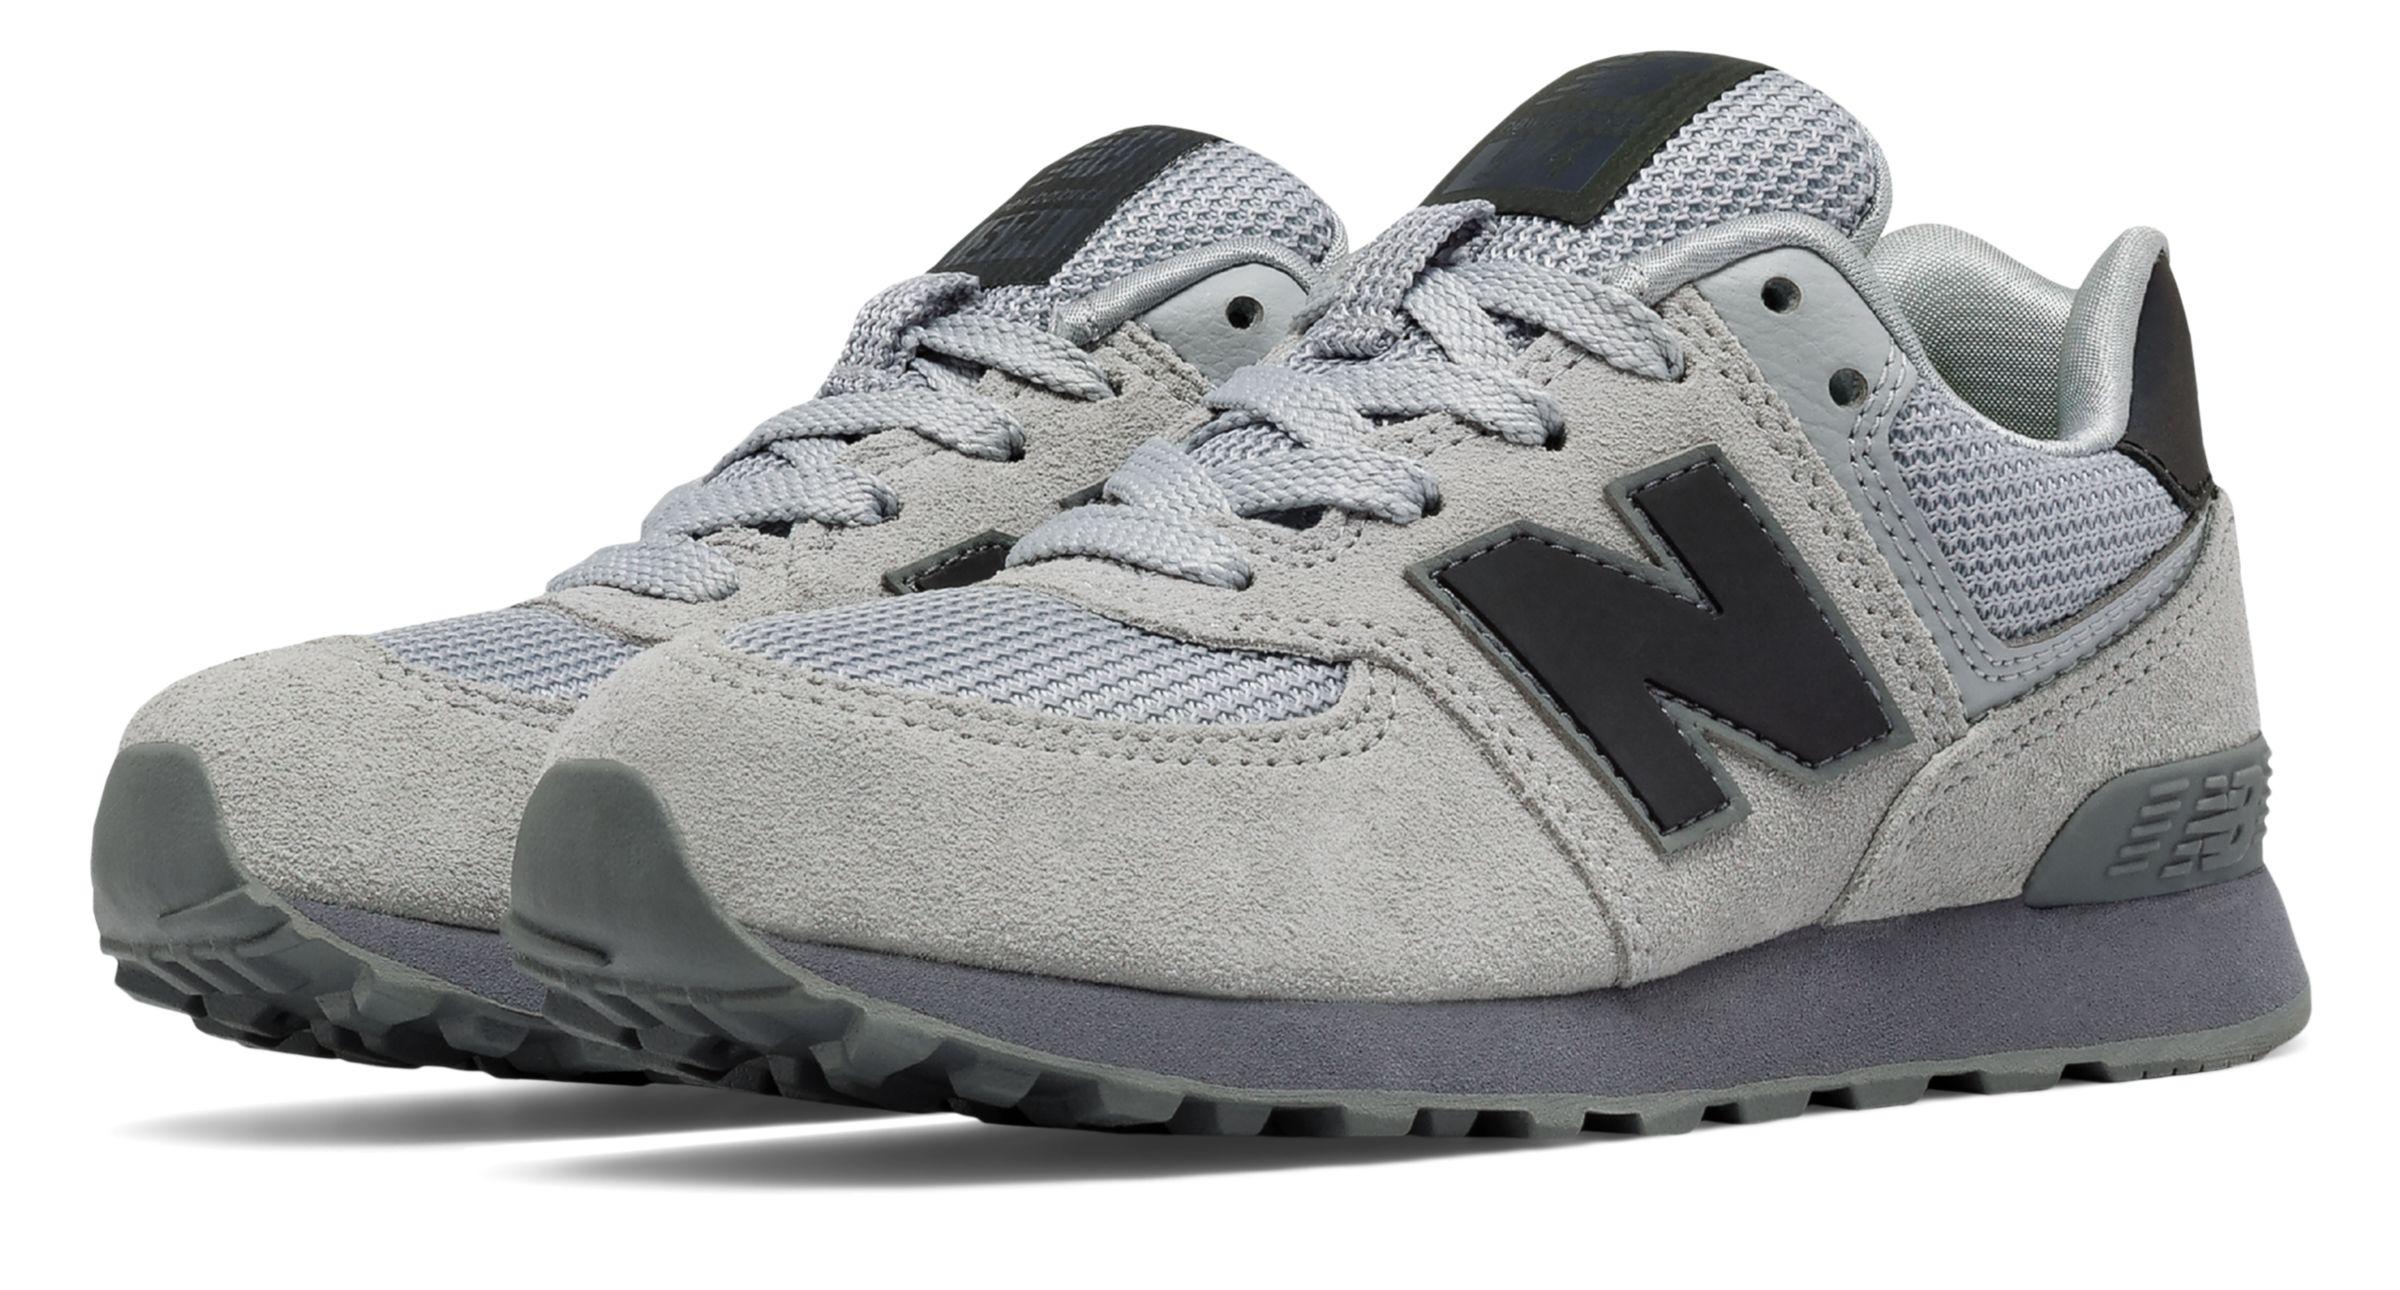 New Balance 574 Urban Twilight Pre - school Boys Shoes Grey